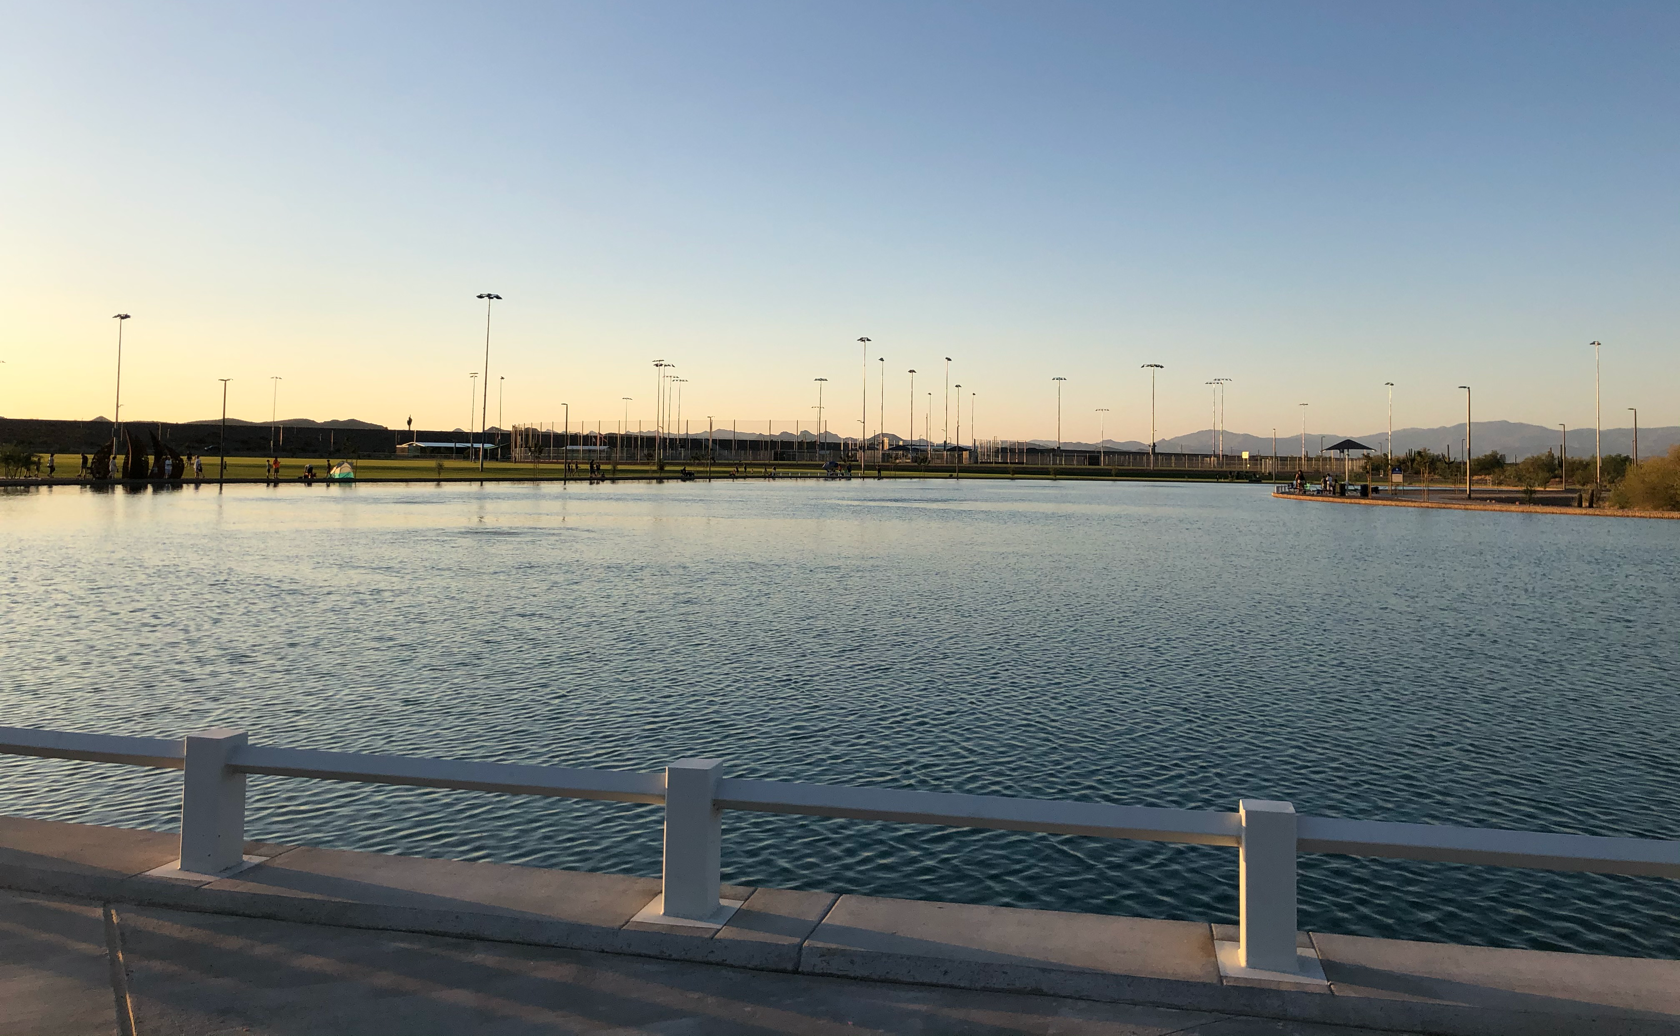 Paloma-Community-Lake-Fishing-Guide-Peoria-AZ-01 Copy 4